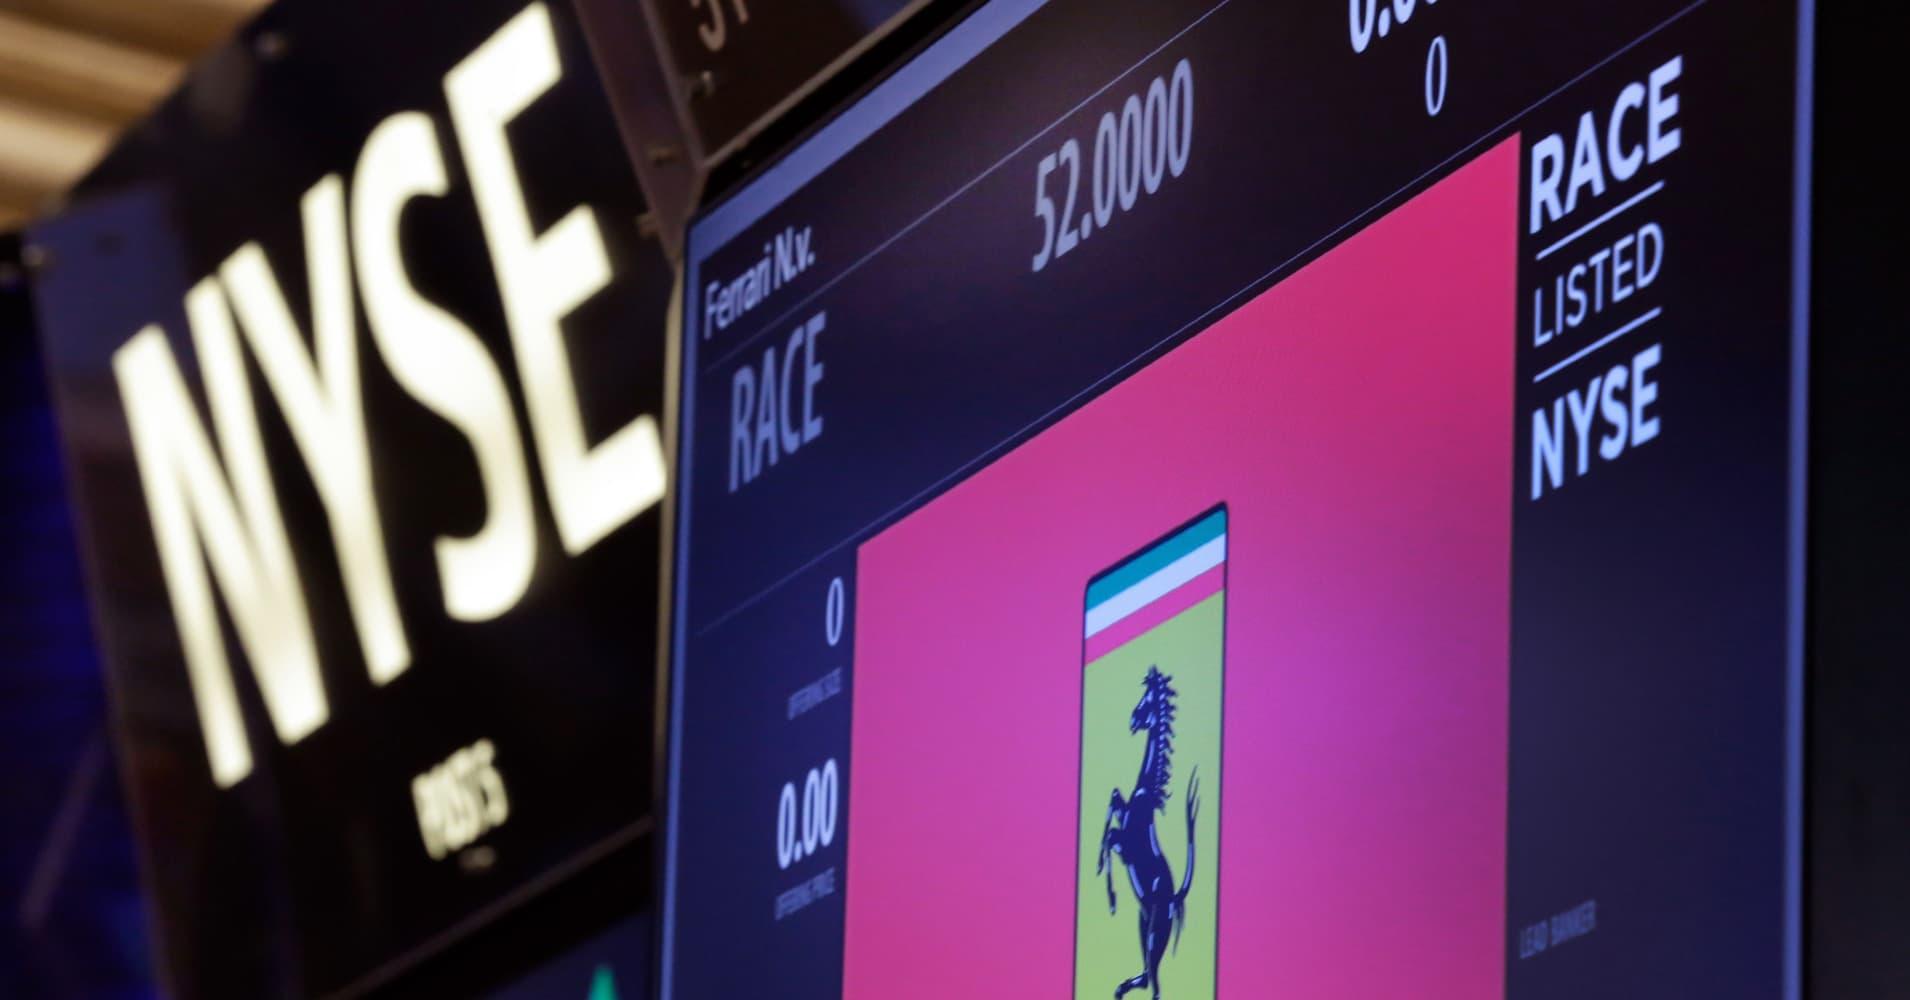 Ferrari ipo prices at 52share within range biocorpaavc Choice Image